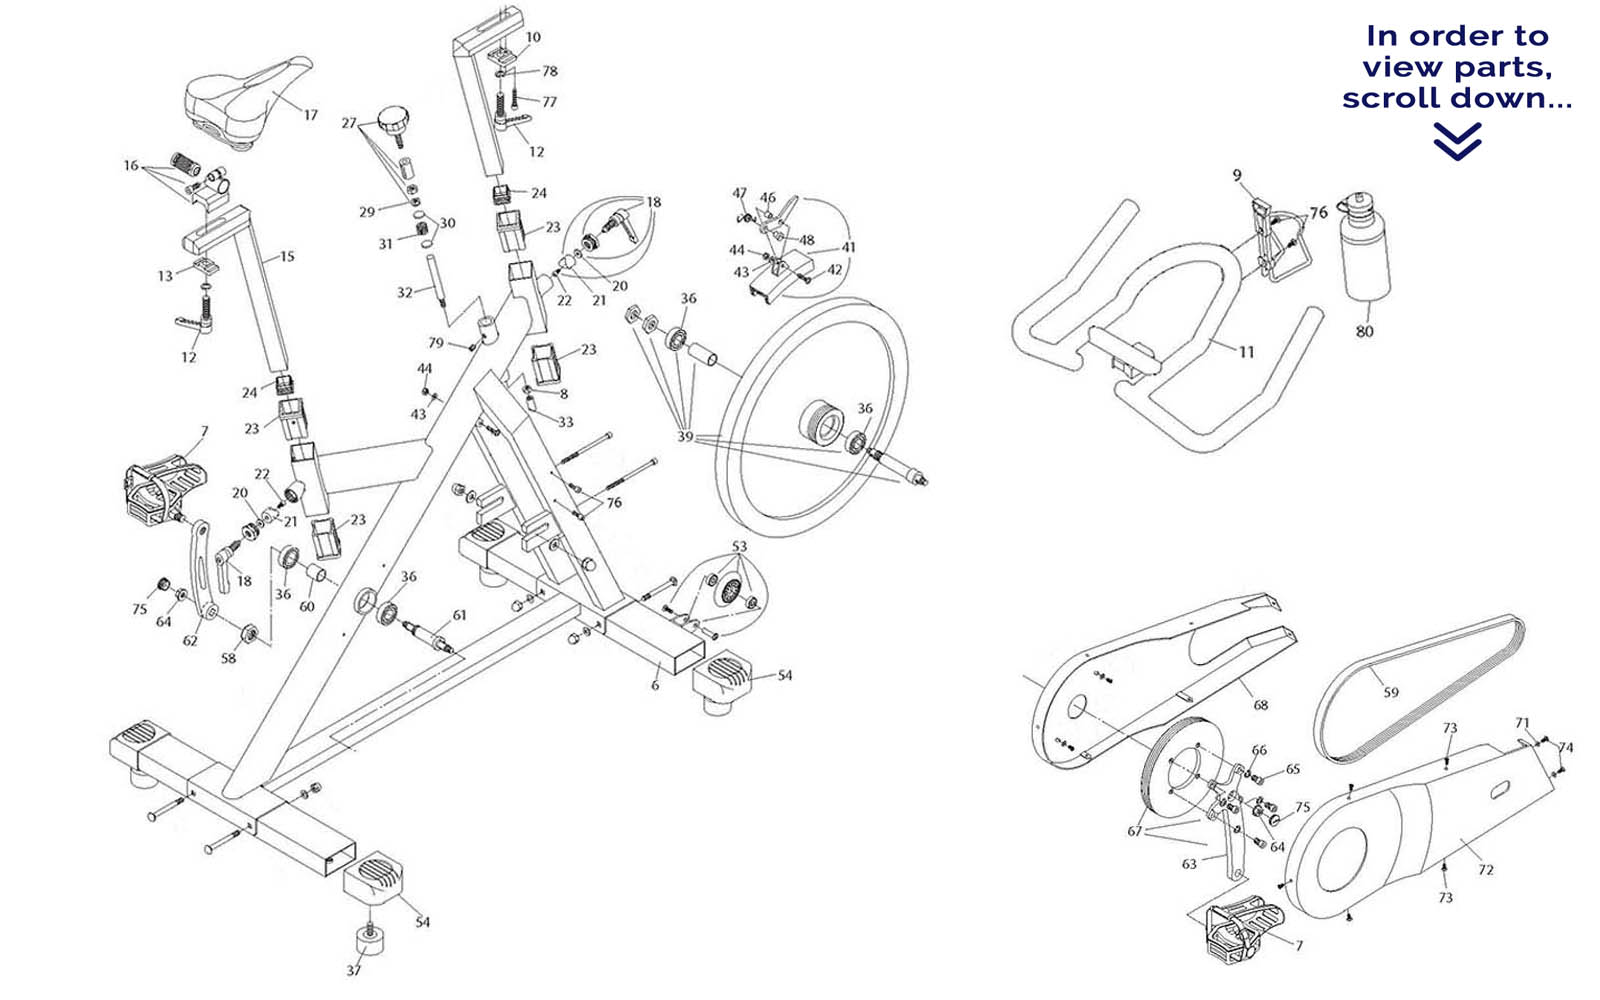 ES600 diagram vision fitness es600 es700 scroll down to view parts